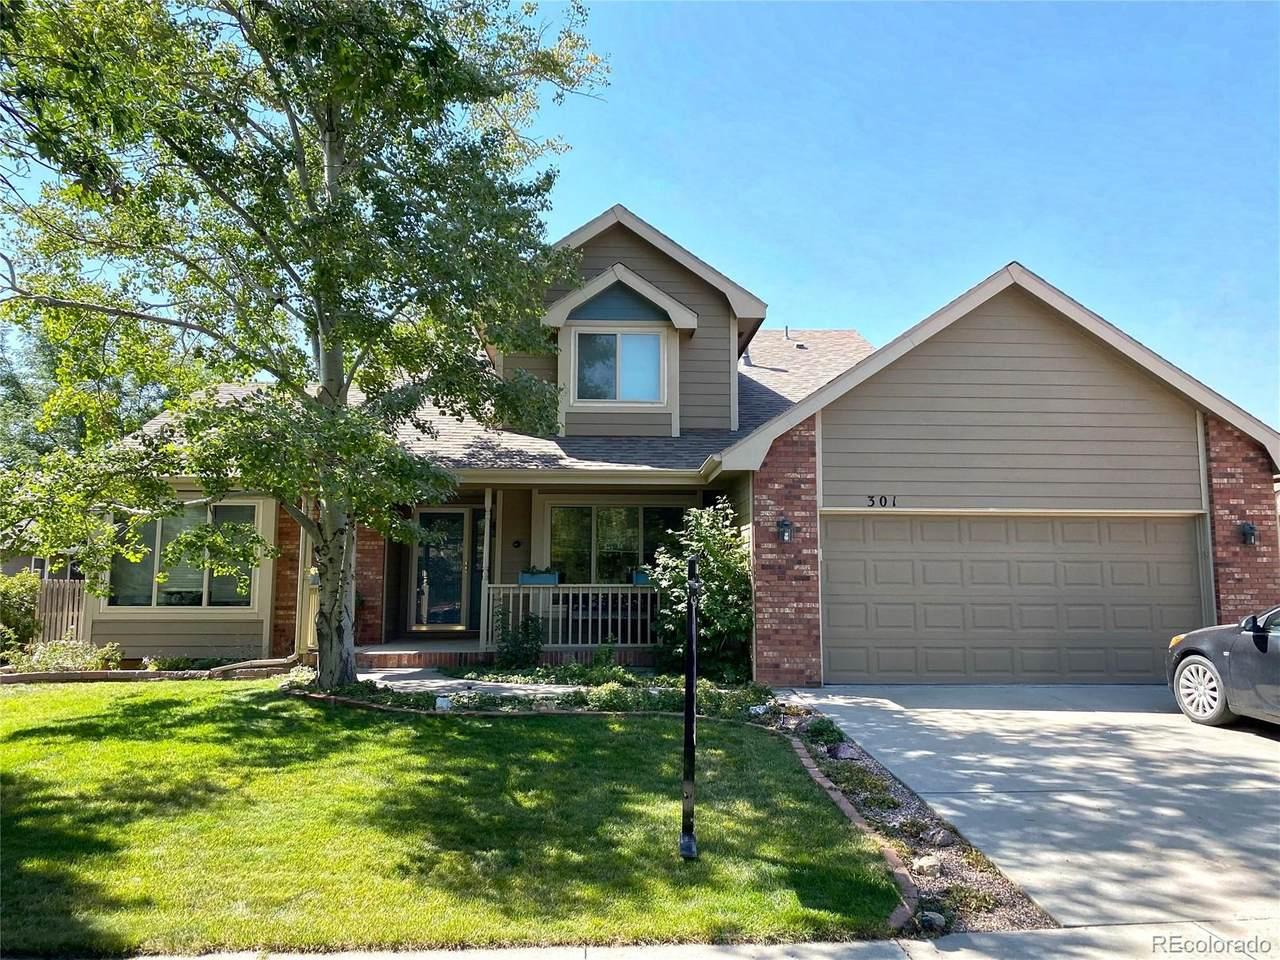 301 Cheyenne Drive - Photo 1